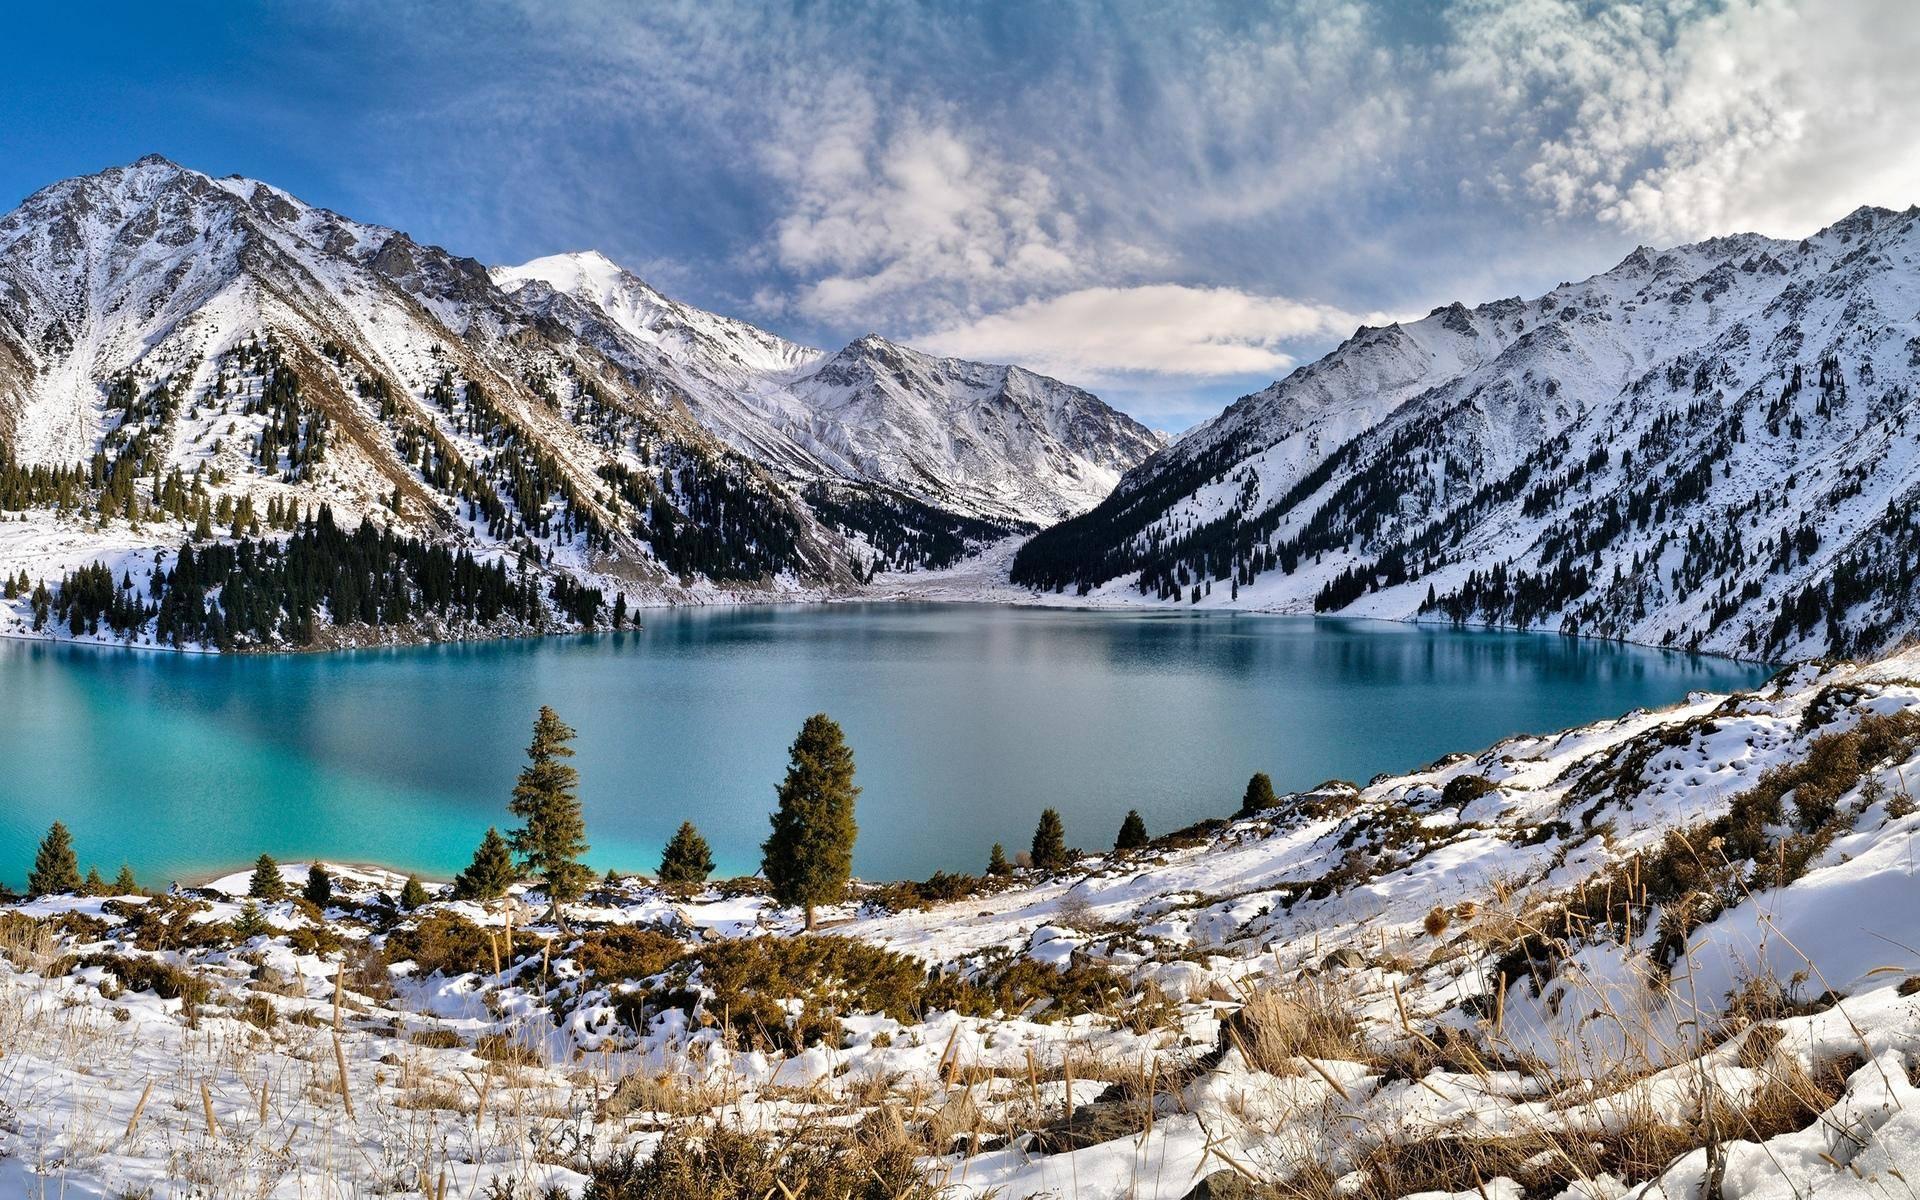 winter_mountains_lscape.jpg